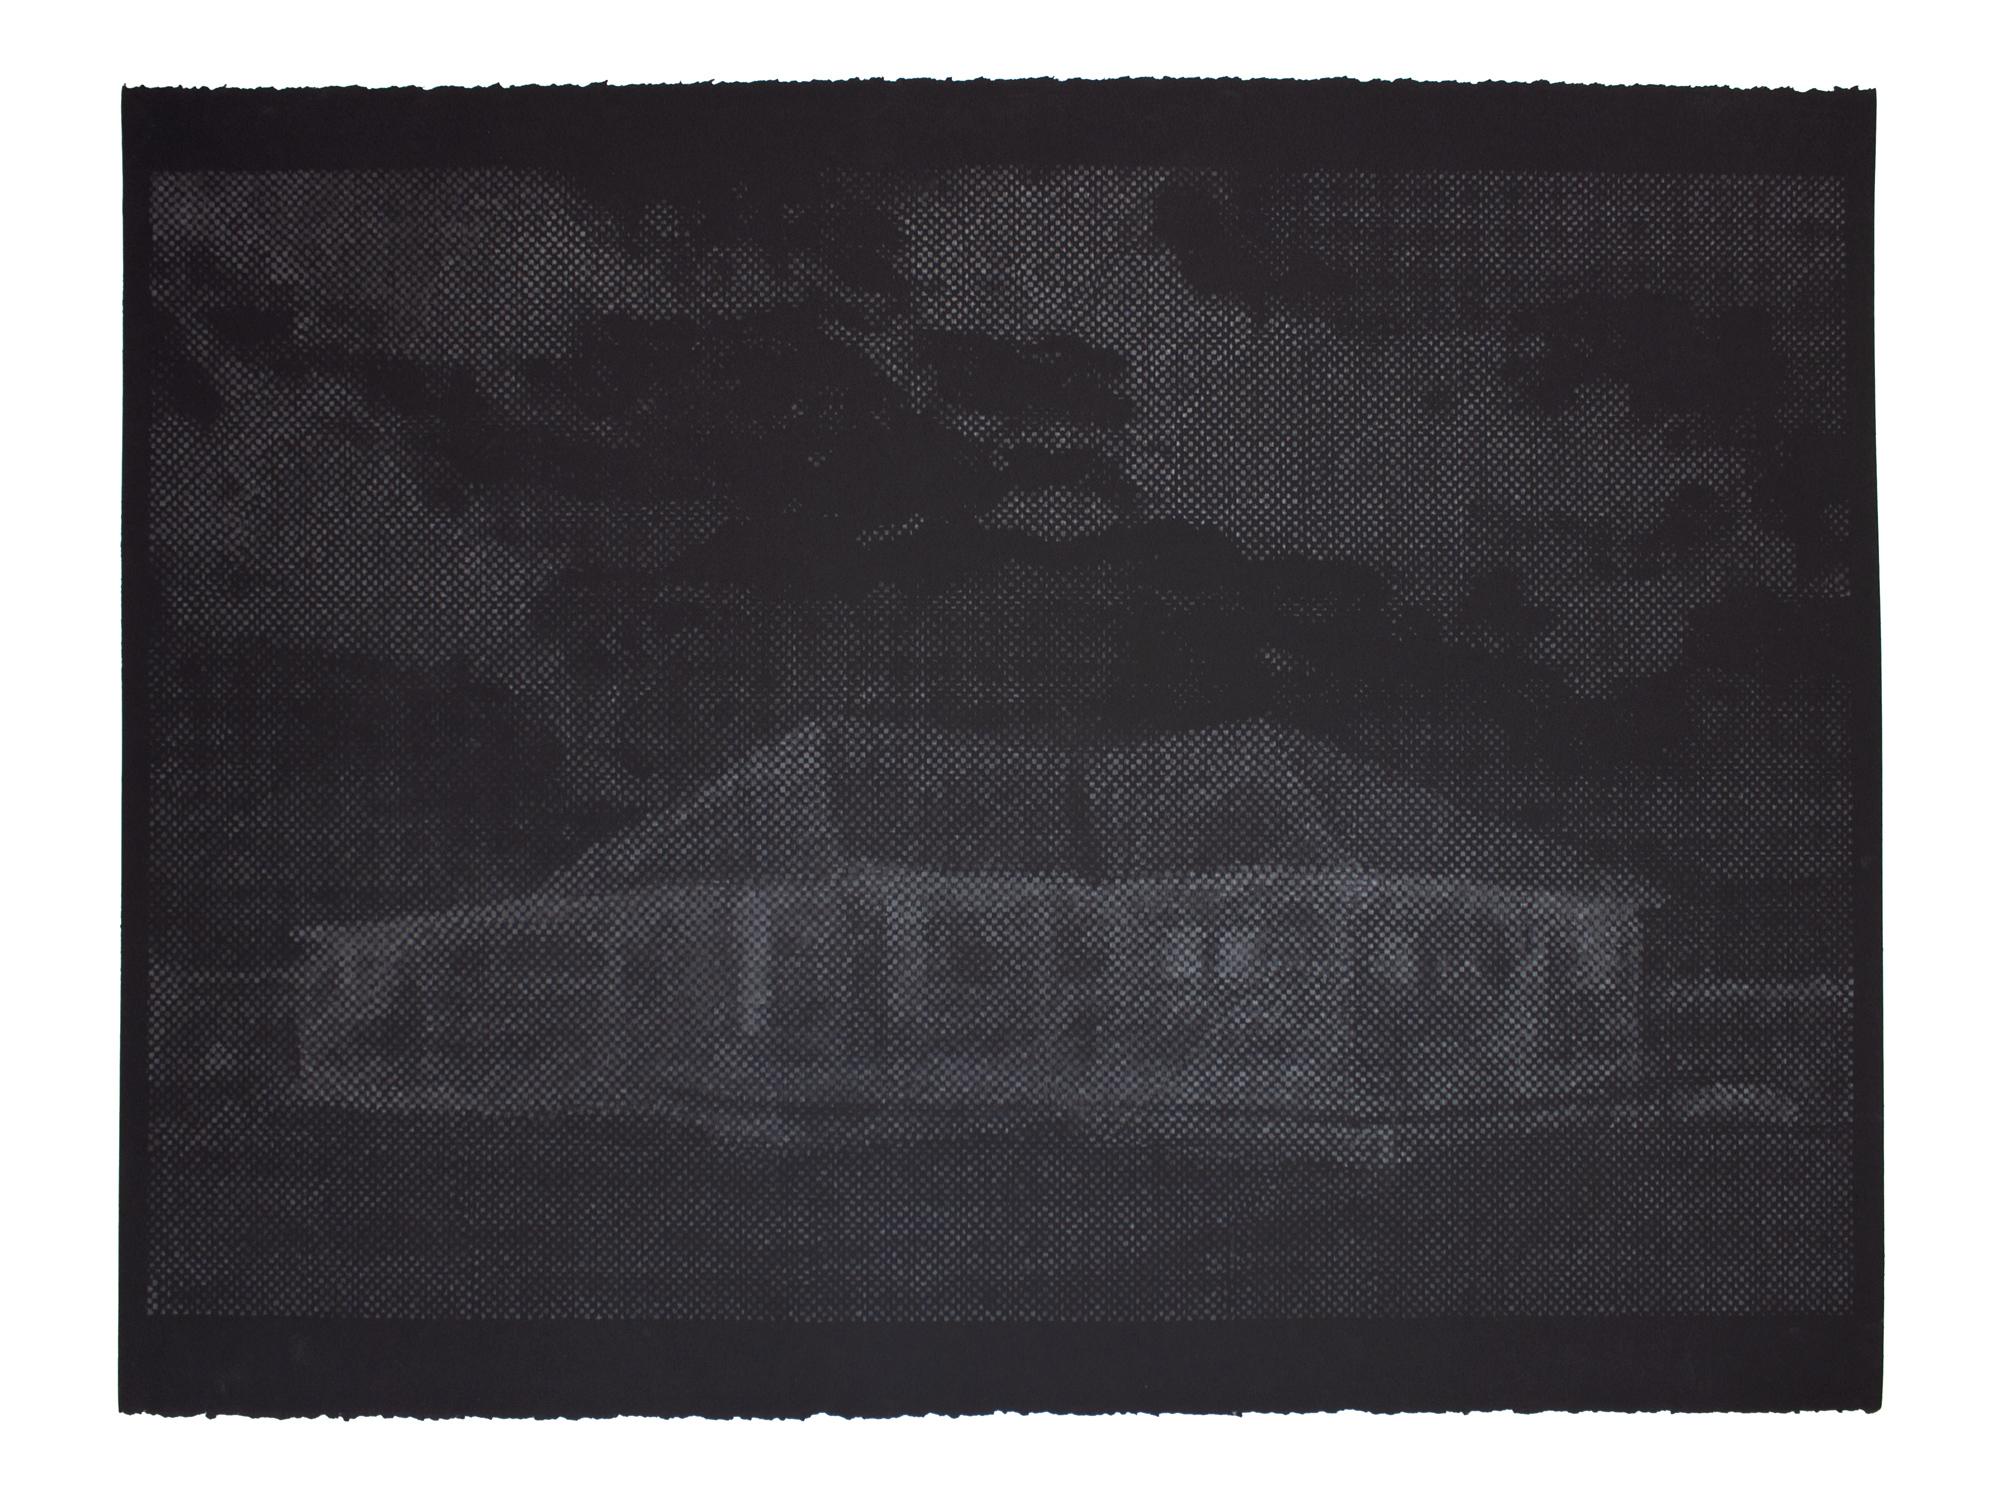 John Whitten,  Cabin , graphite on Black Paper, 23 x 30 in